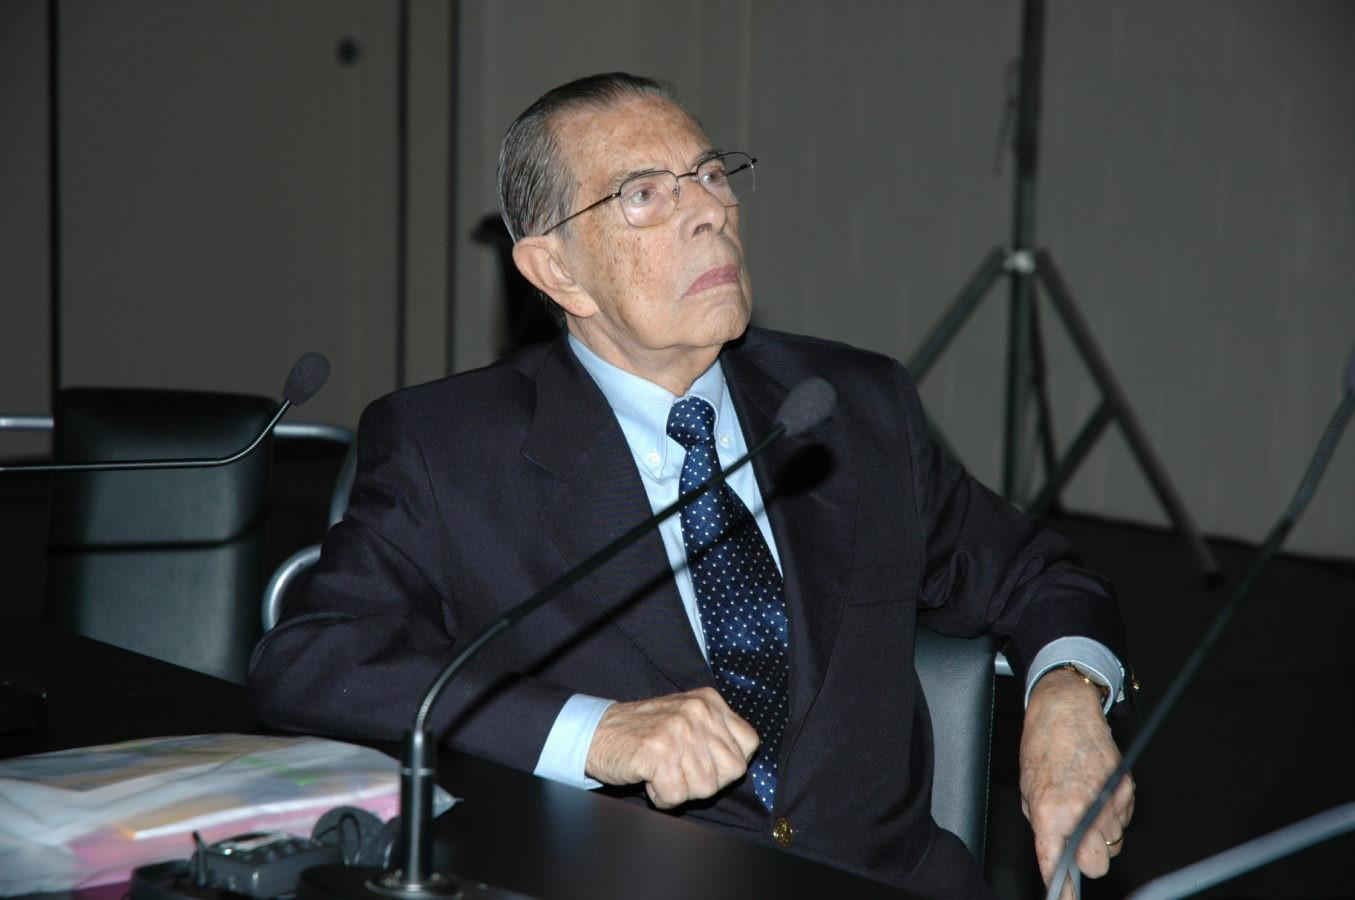 Prof. Álvaro coordenando mesa redonda